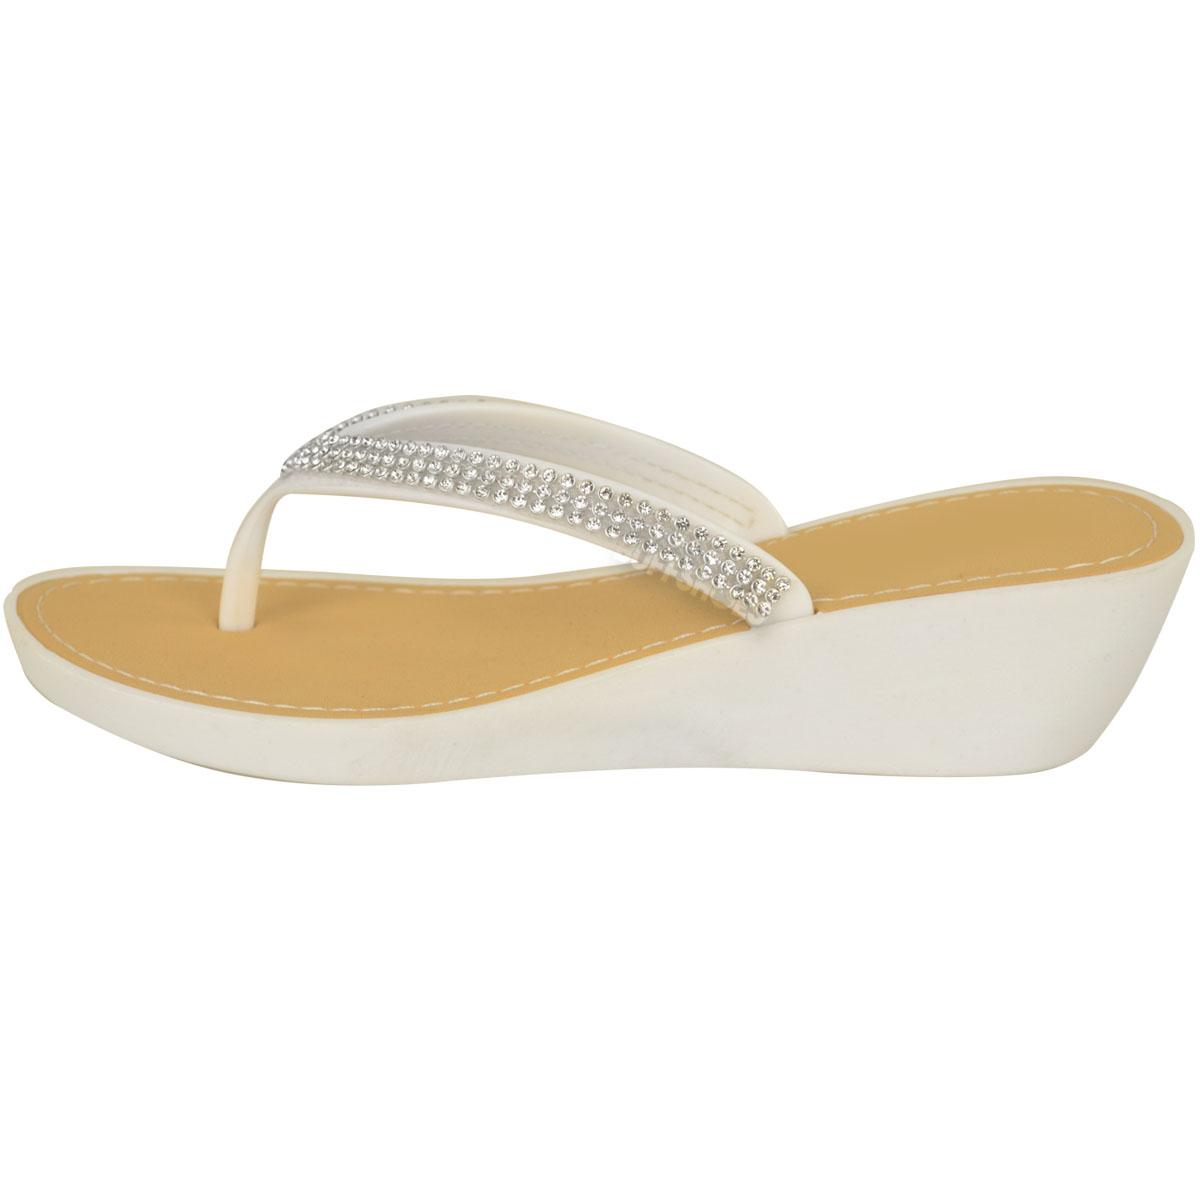 damen keilabsatz gummi sandalen niedriger absatz zehentrenner diamant zehensteg ebay. Black Bedroom Furniture Sets. Home Design Ideas